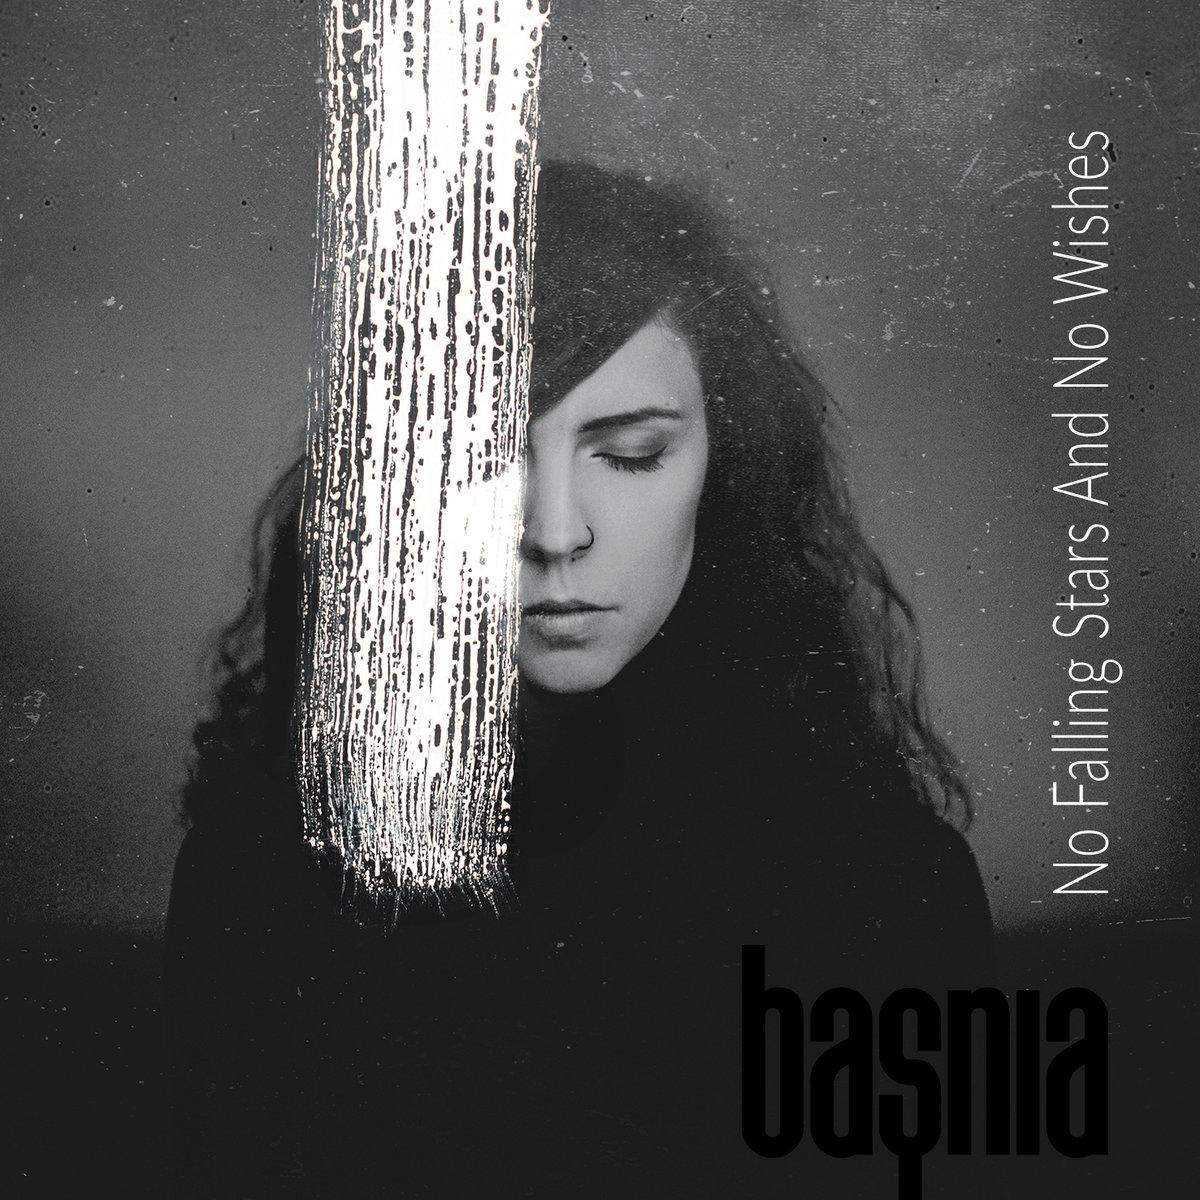 basnia - No Falling Stars And No Wishes (CD - digital; 2019)